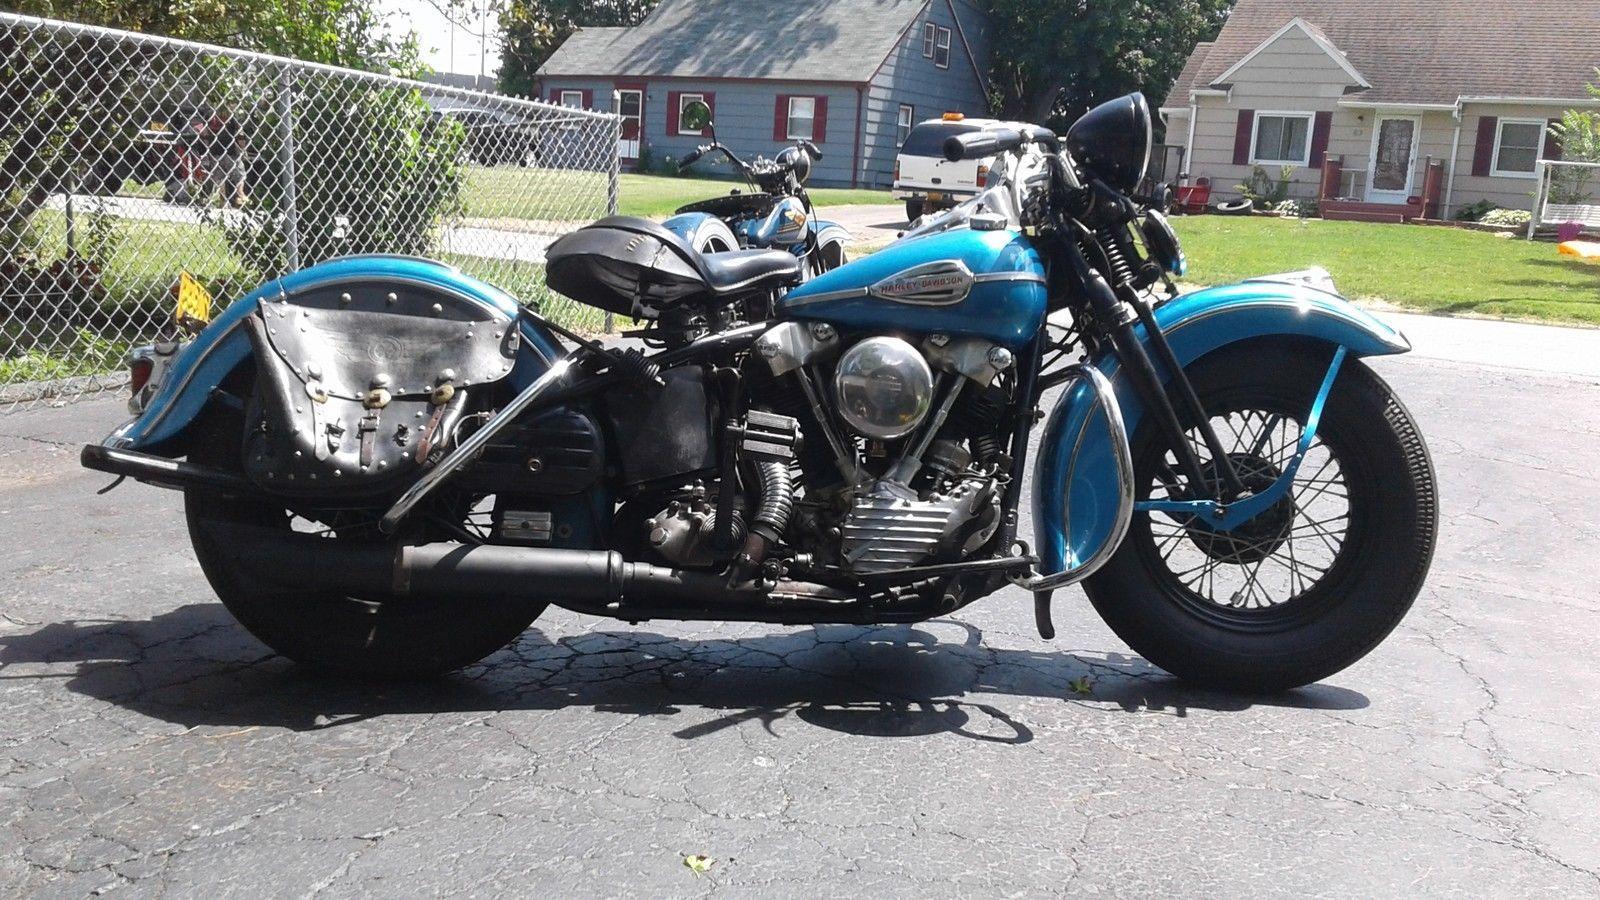 1946 Harley-Davidson Other | Harley davidson, Harley davidson ...